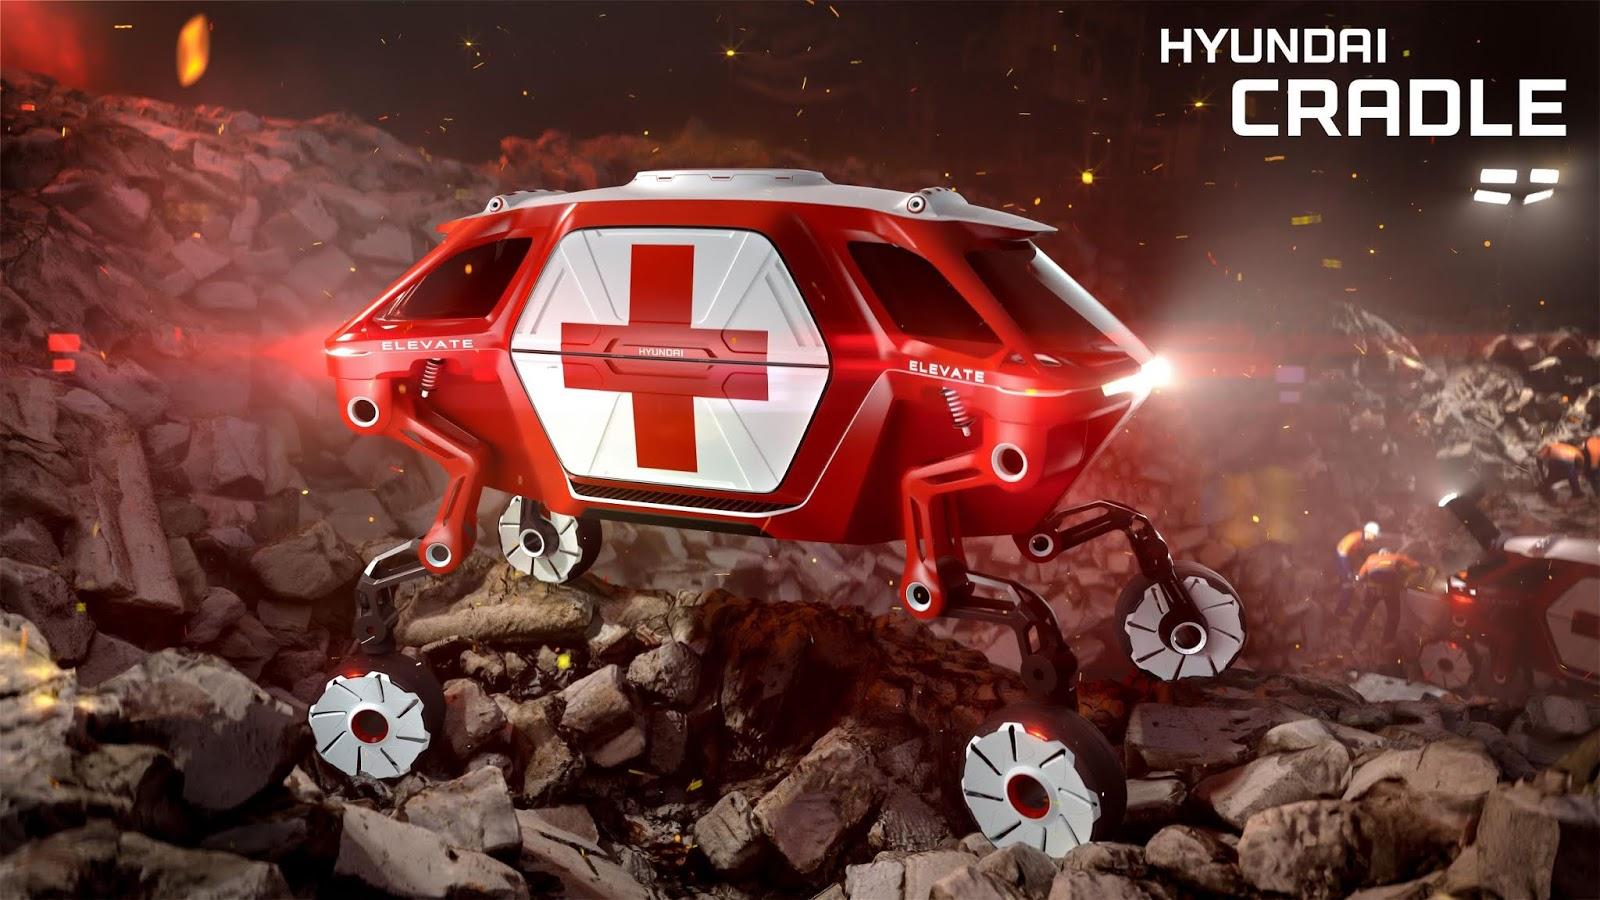 Hyundai presenta el primer auto que camina para salvar vidas